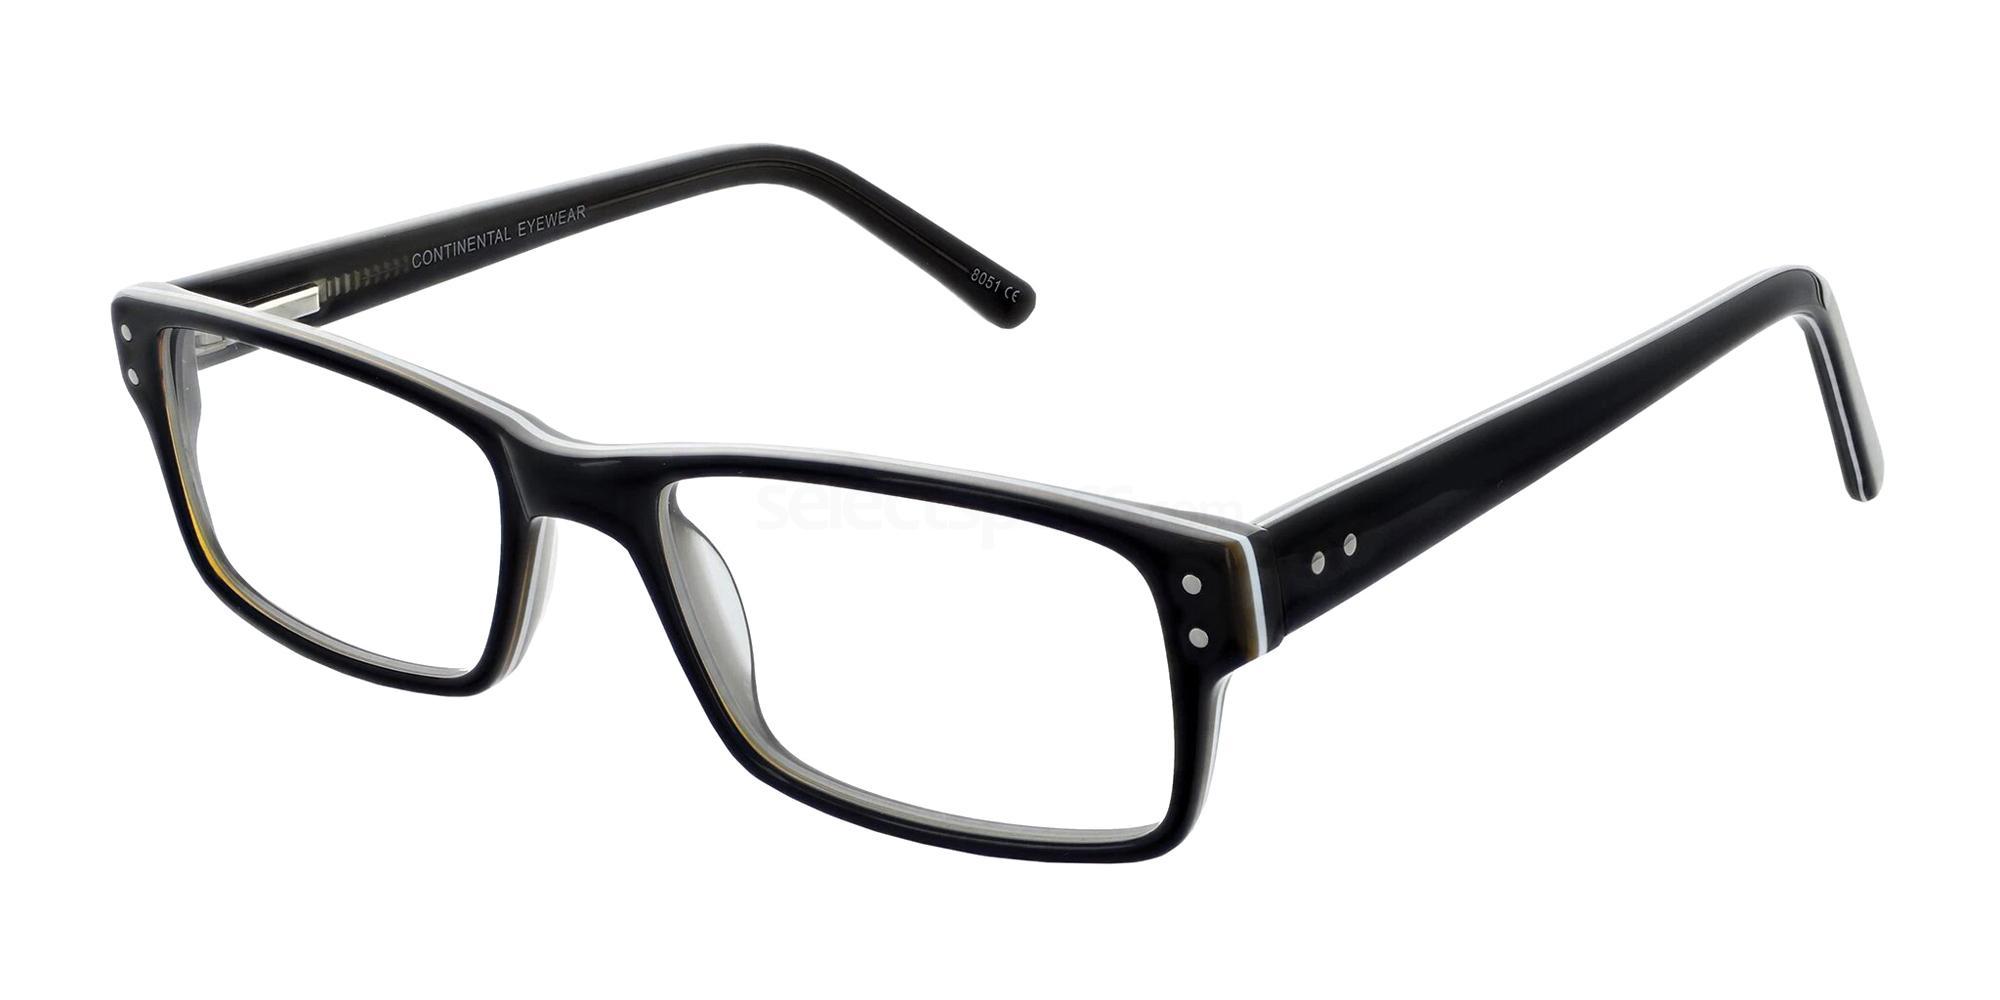 Black 77 Glasses, Zenith Zest